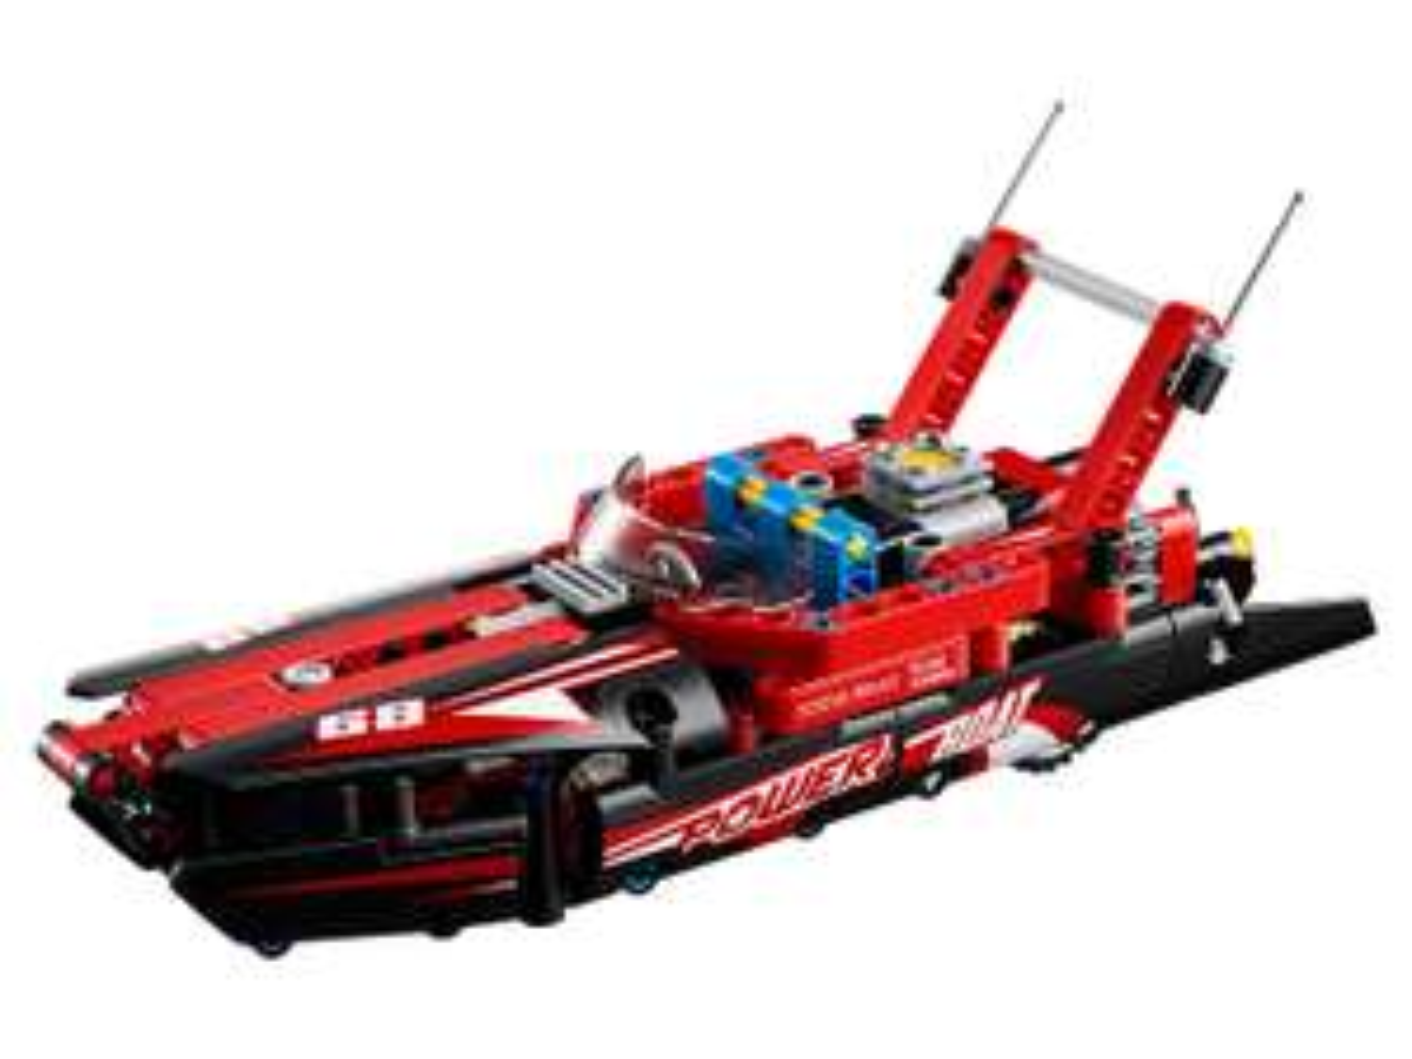 Lego Technic powerboat Sainsbury's Kidderminster instore for £10